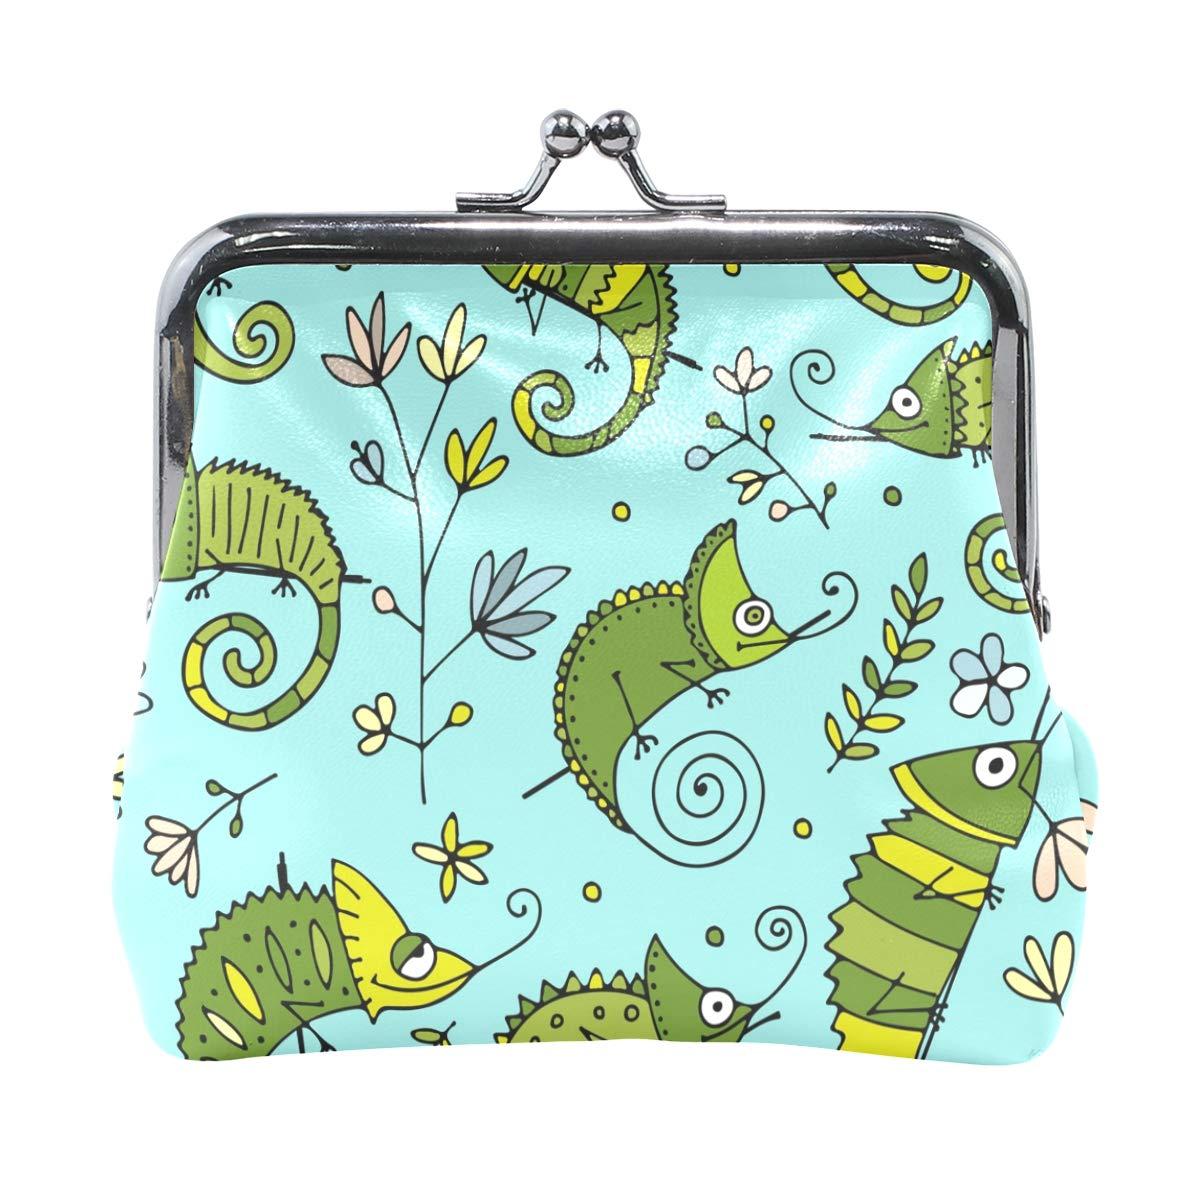 Women Wallet Purse Cute Chameleon Animal Seamless Pattern Clutch Bag Leather